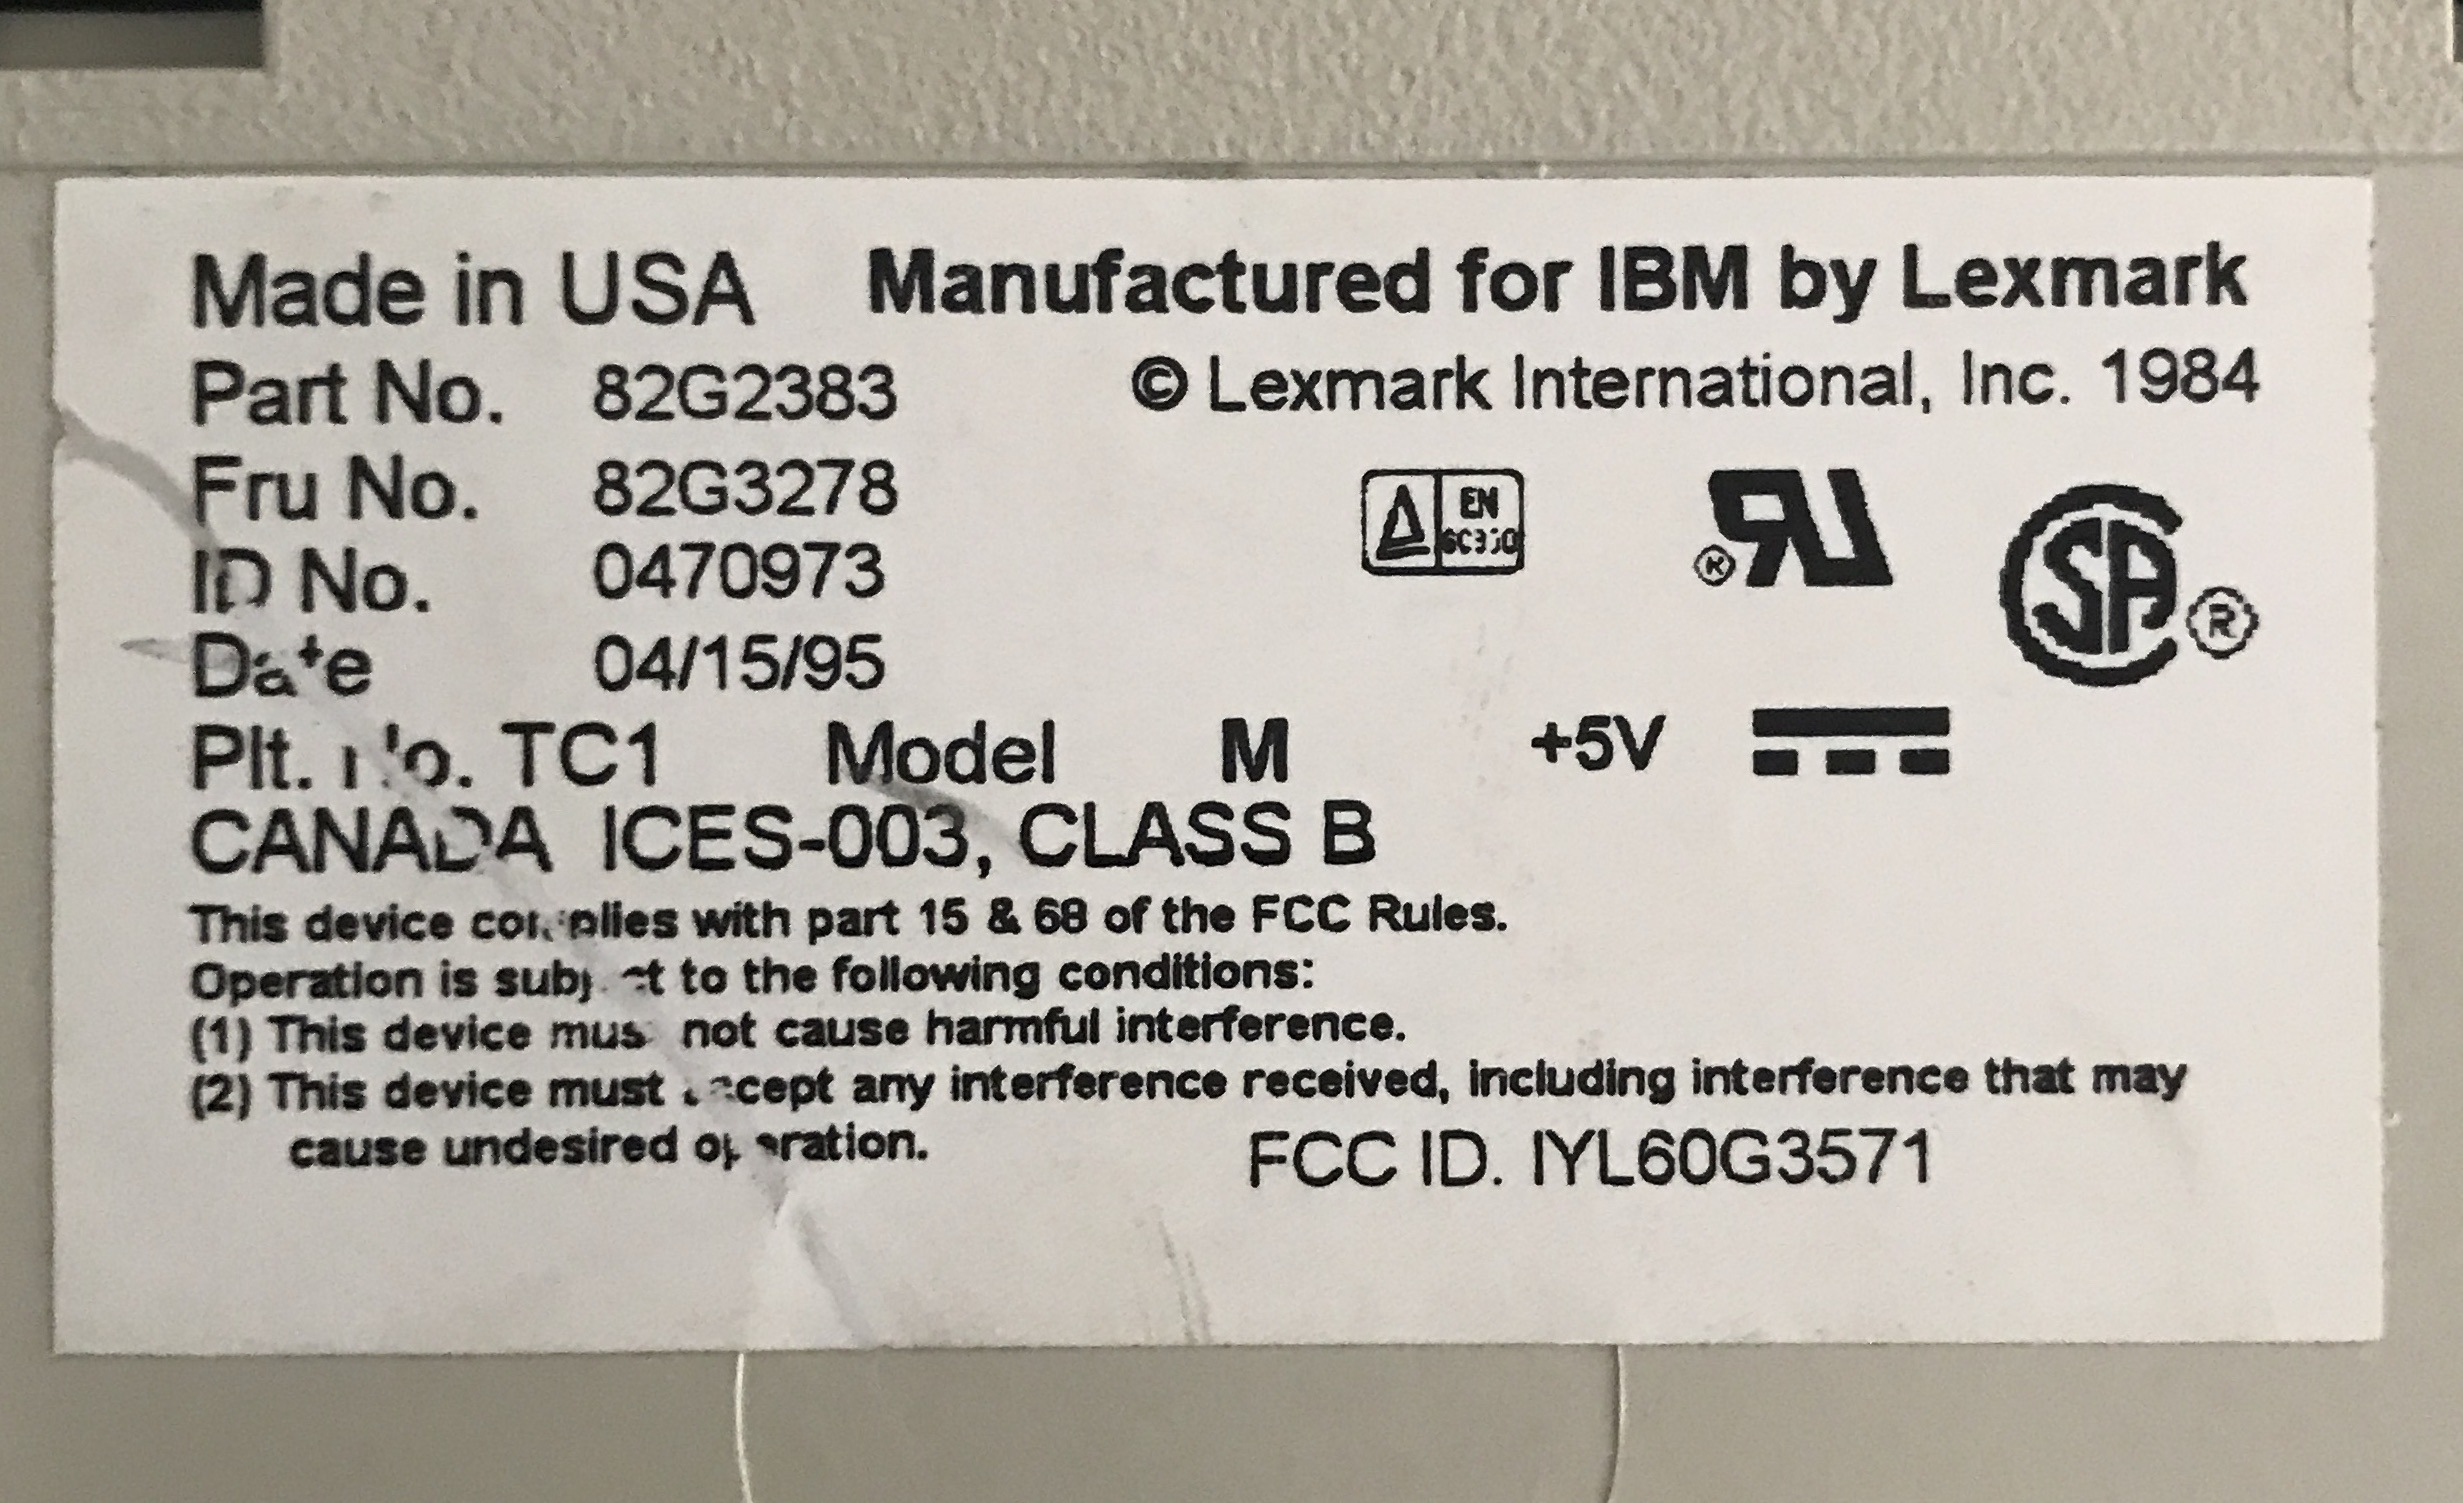 My IBM Model M was born in 95